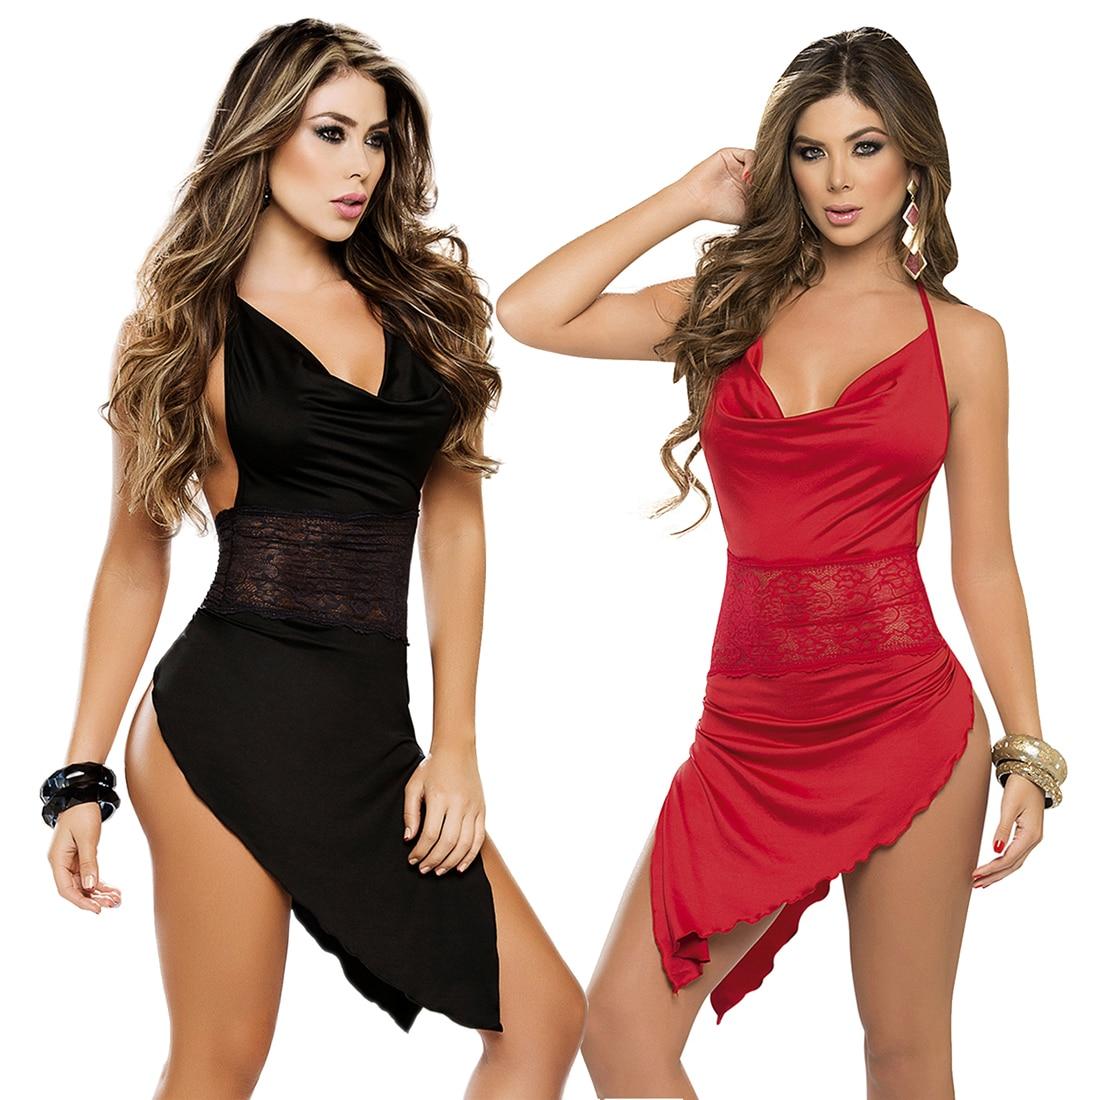 [Best] Free shipping Womens V-neck Satin Sexy Lingerie Nightgown Nightwear Nightie Negligee Party Night Dress Sleepwear